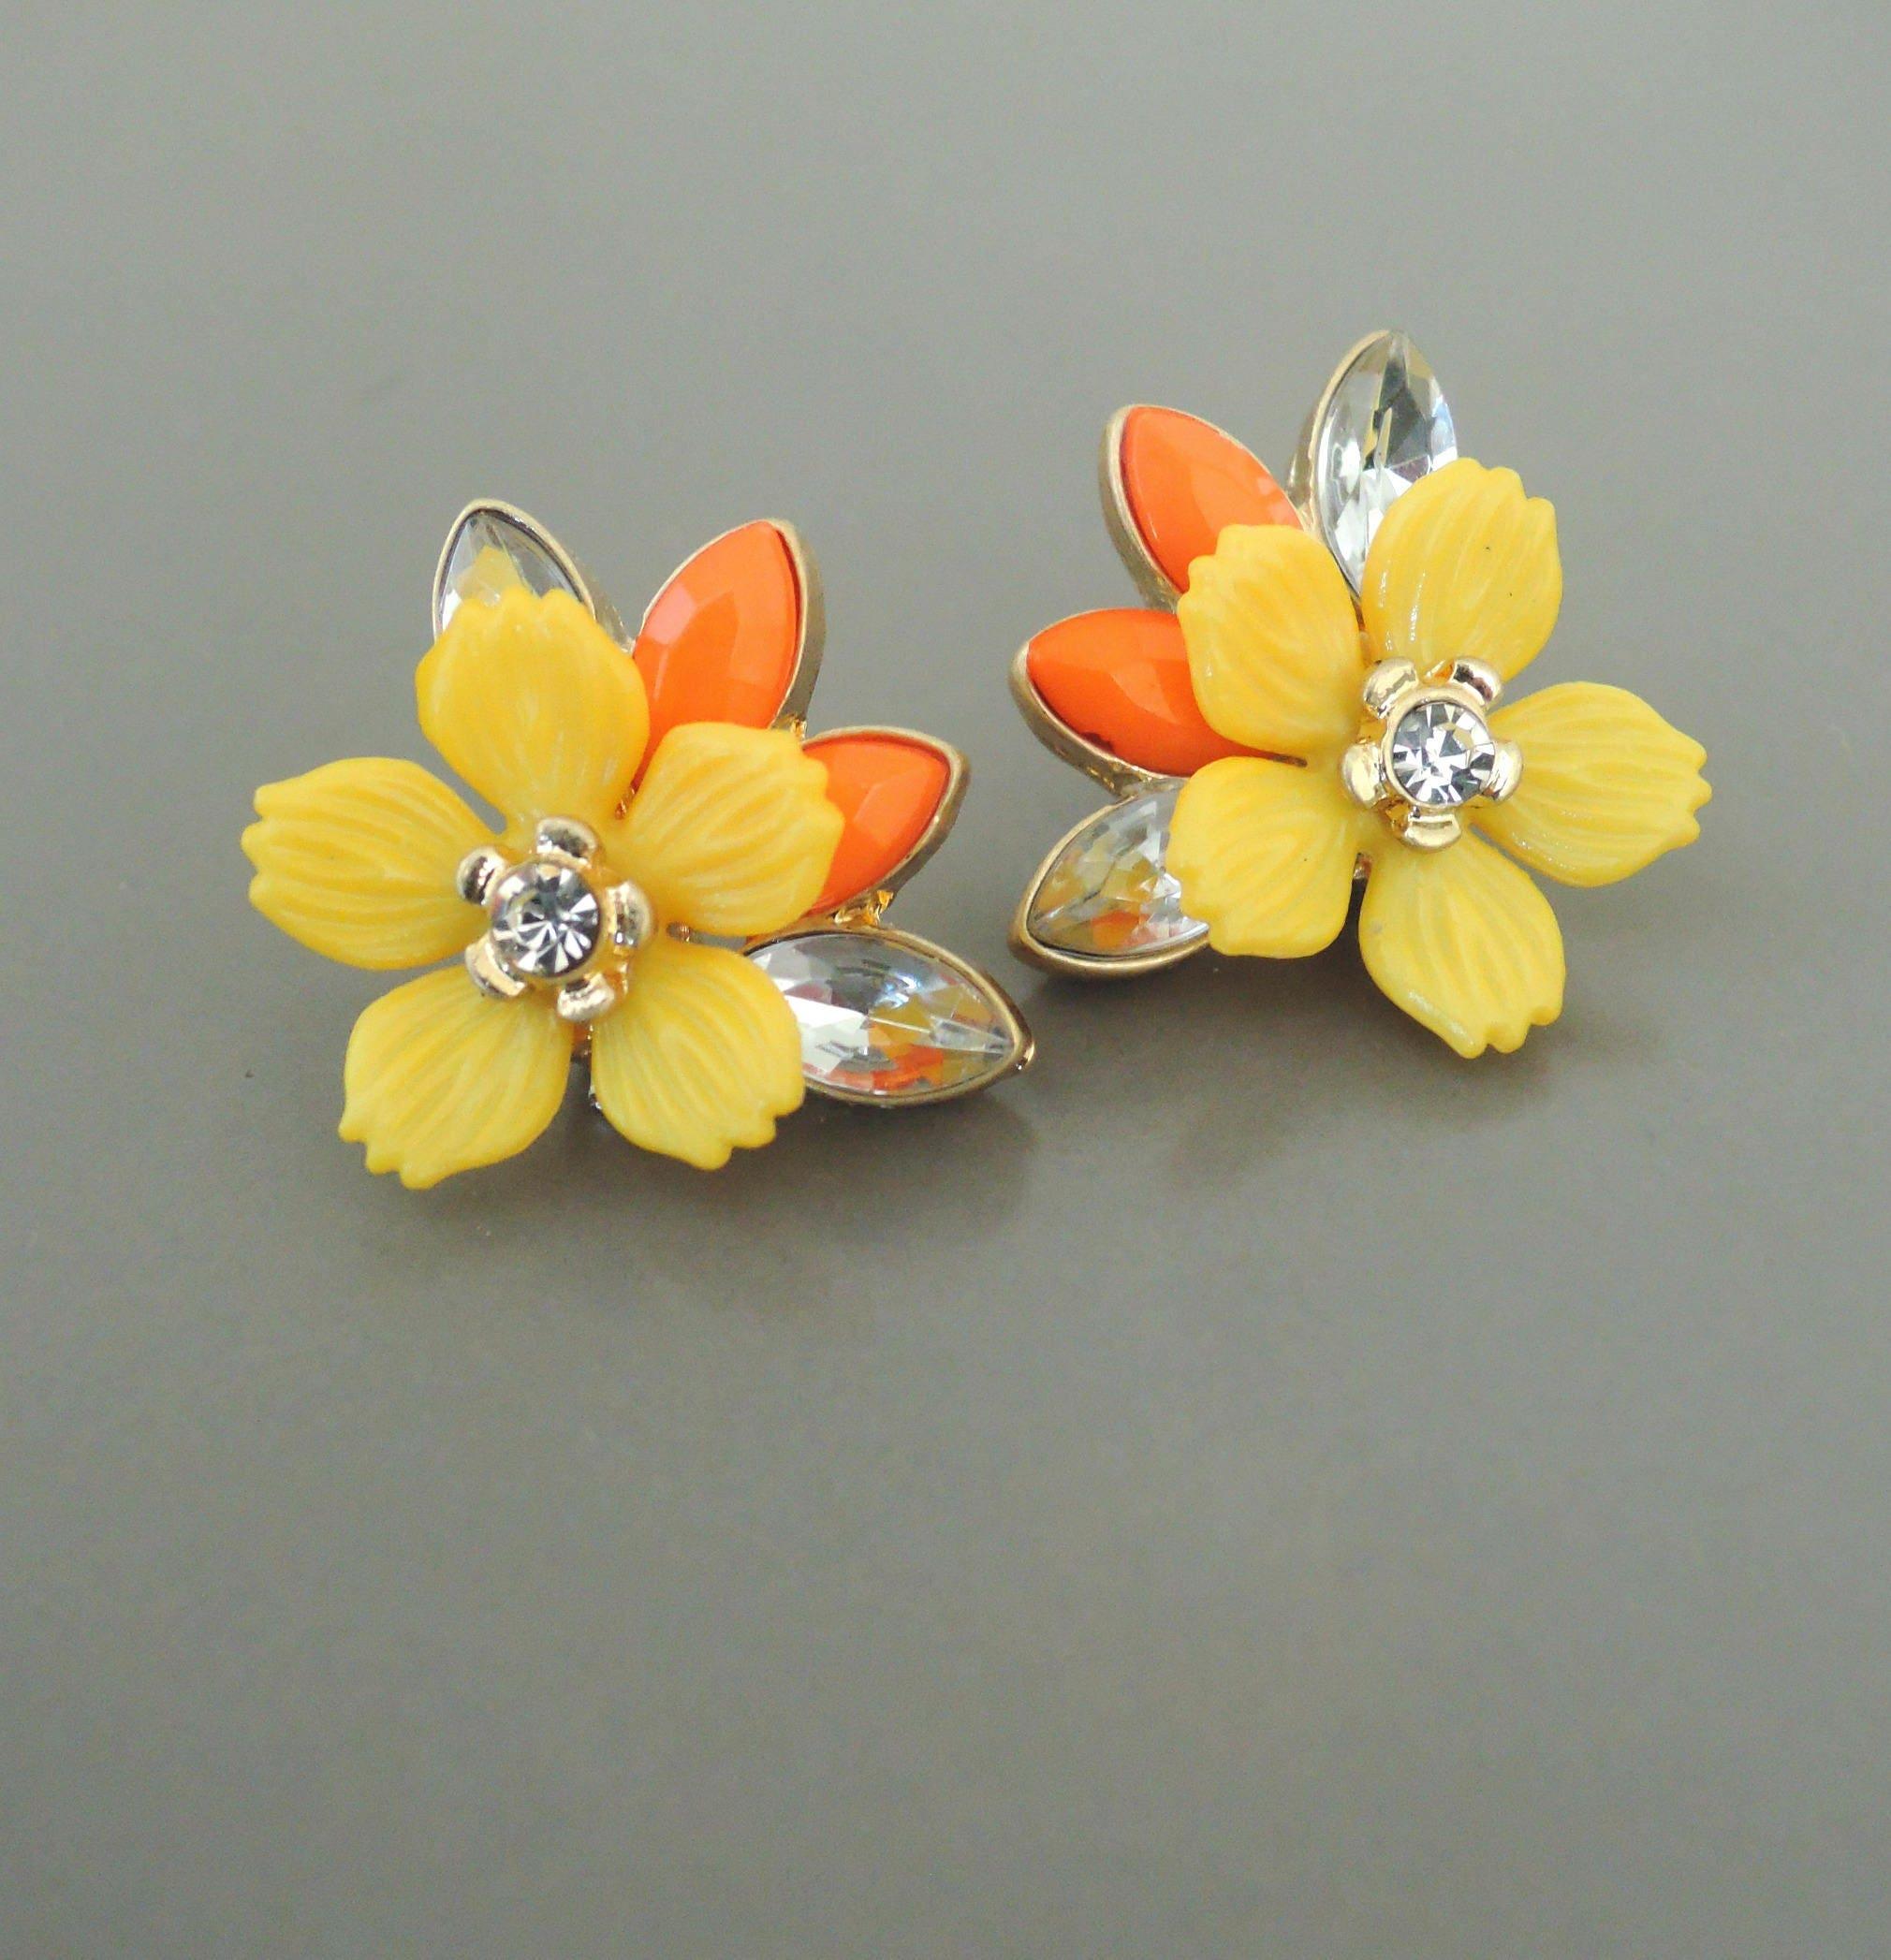 Vintage Inspired Earrings Yellow Earrings Flower Earrings